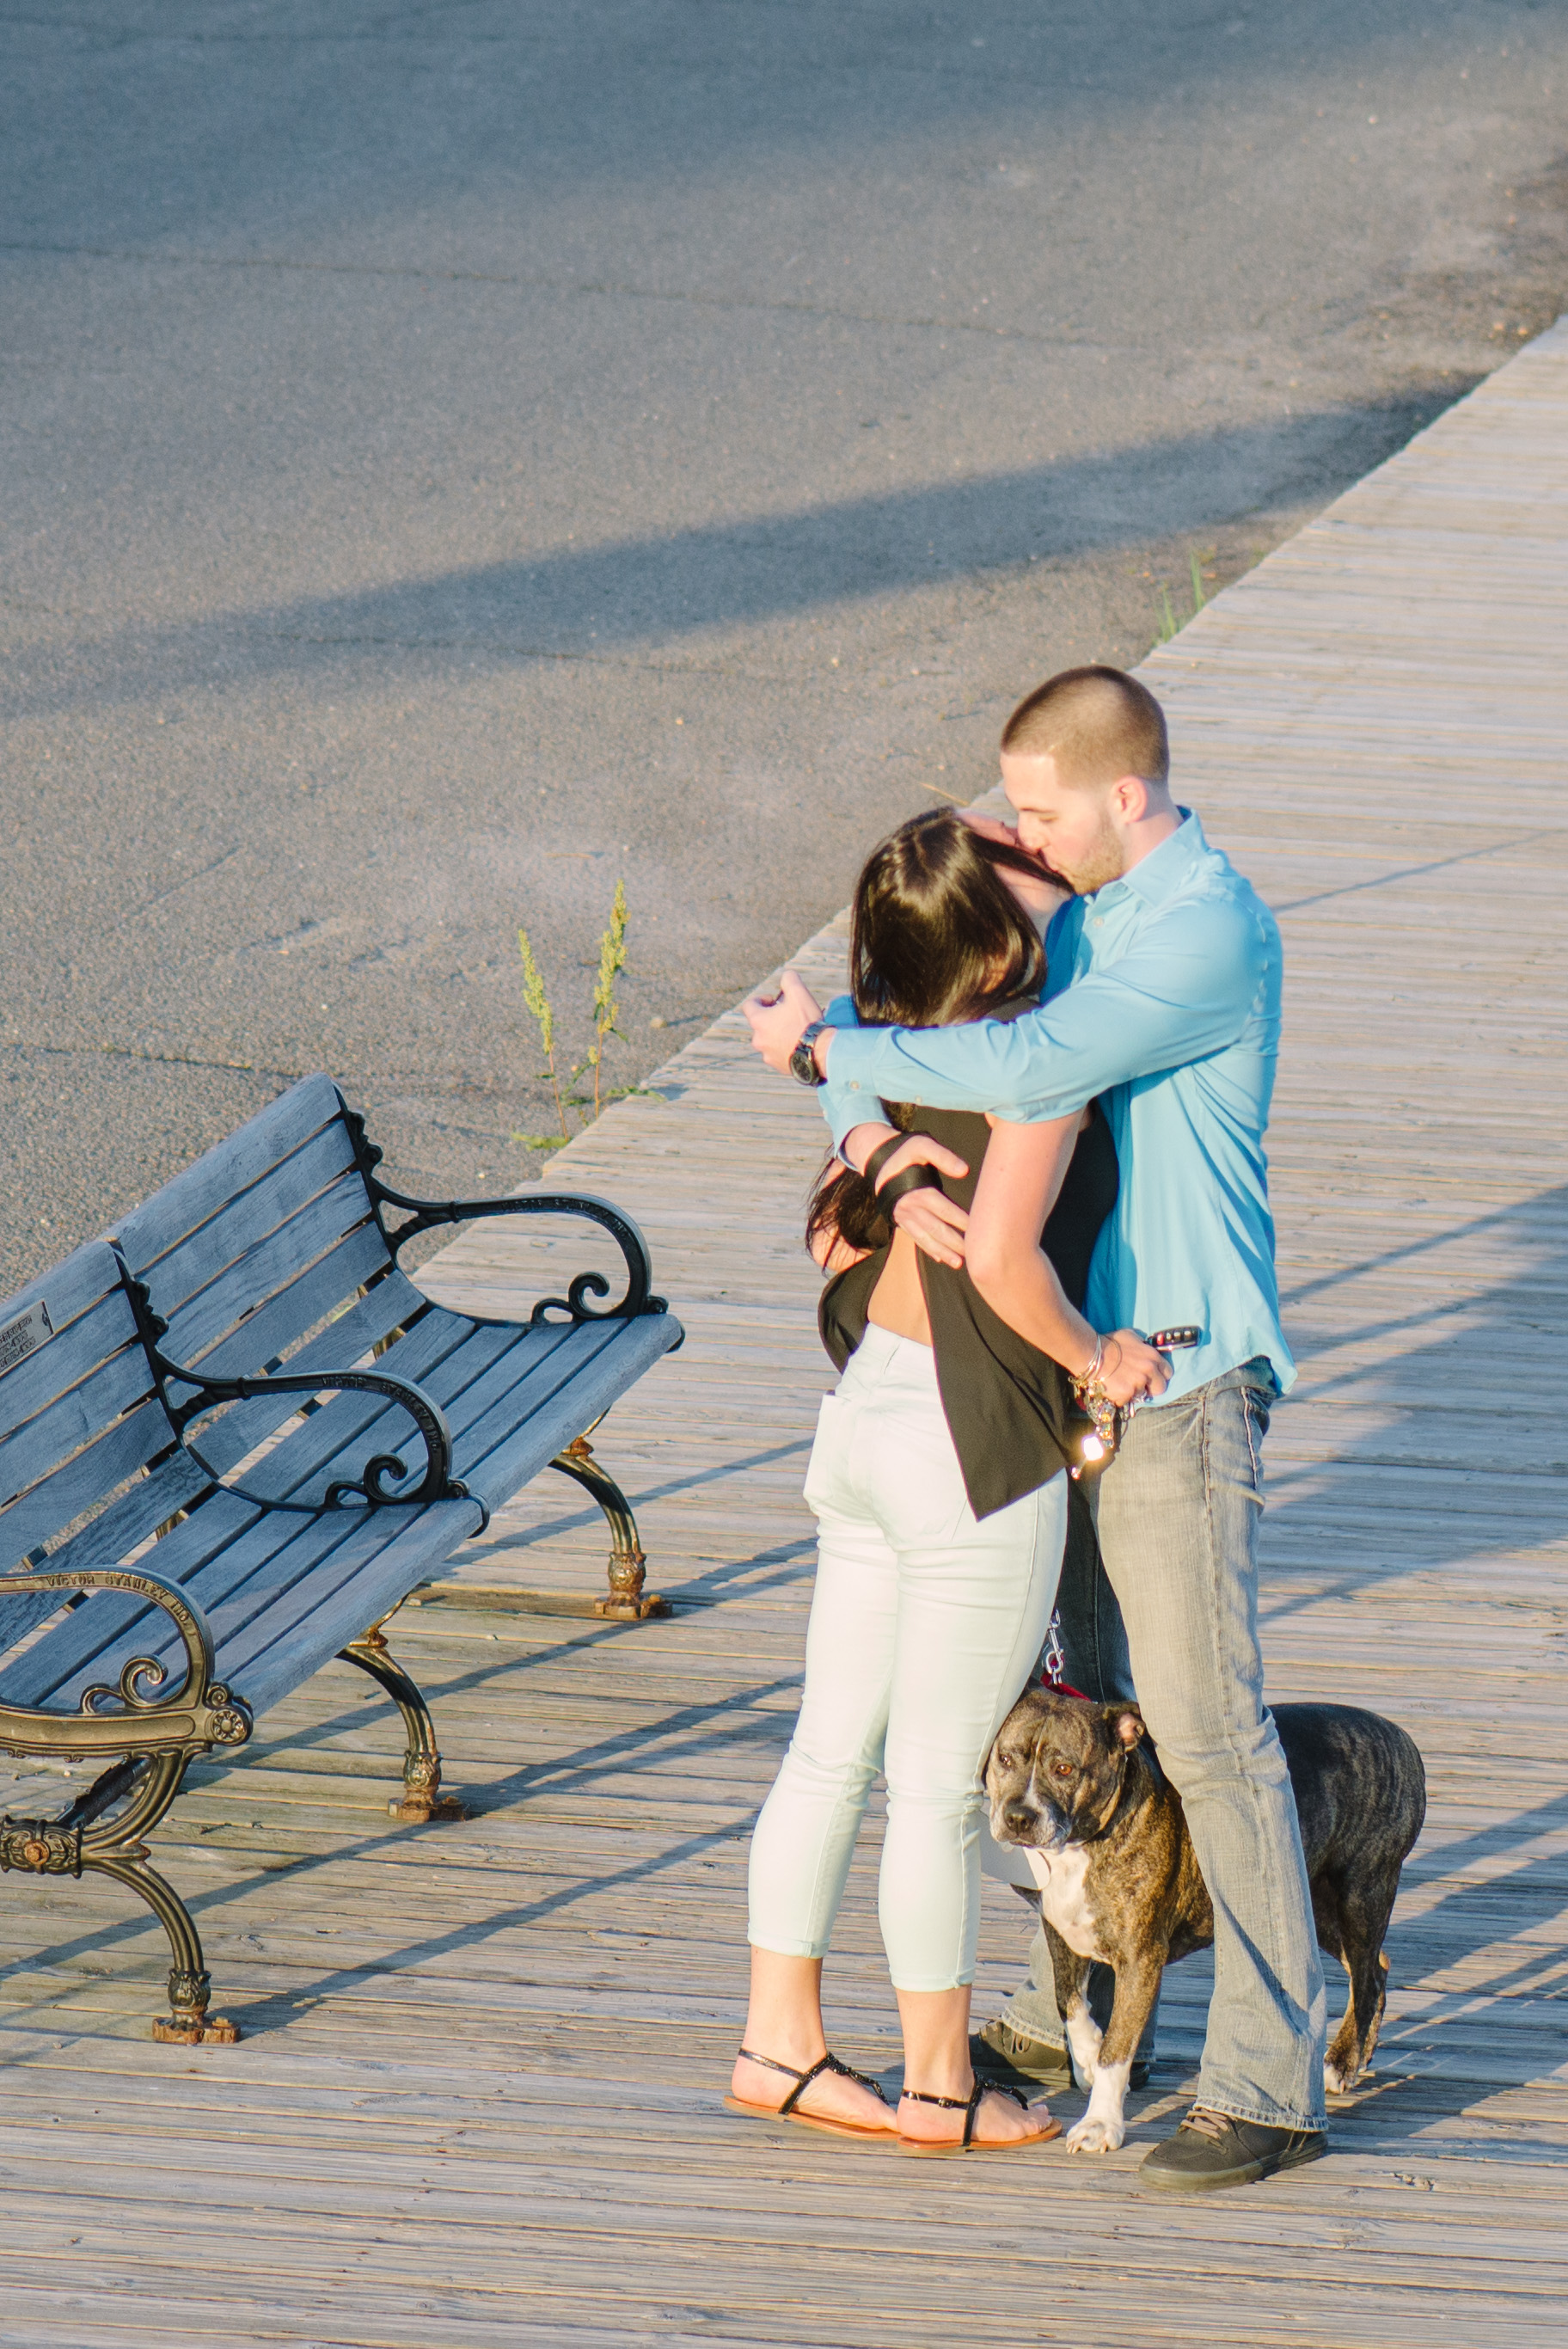 Image 6 of Dog Helps with Scavenger Hunt Proposal